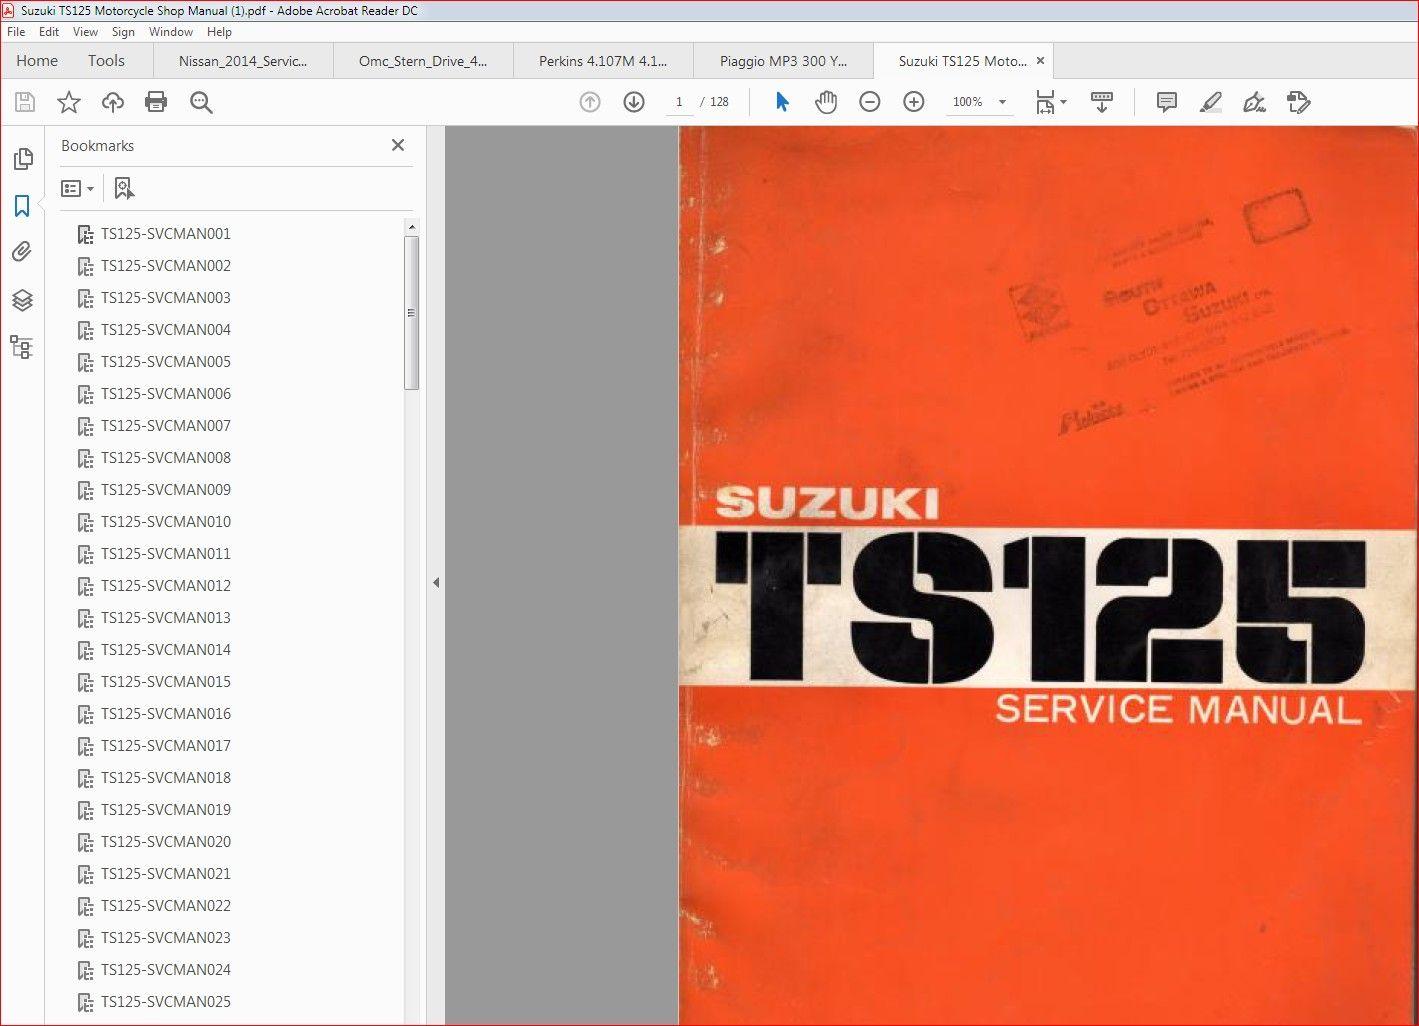 Suzuki Ts125 Motorcycle Shop Manual Suzuki Ts125 Motorcycle Shop Suzuki